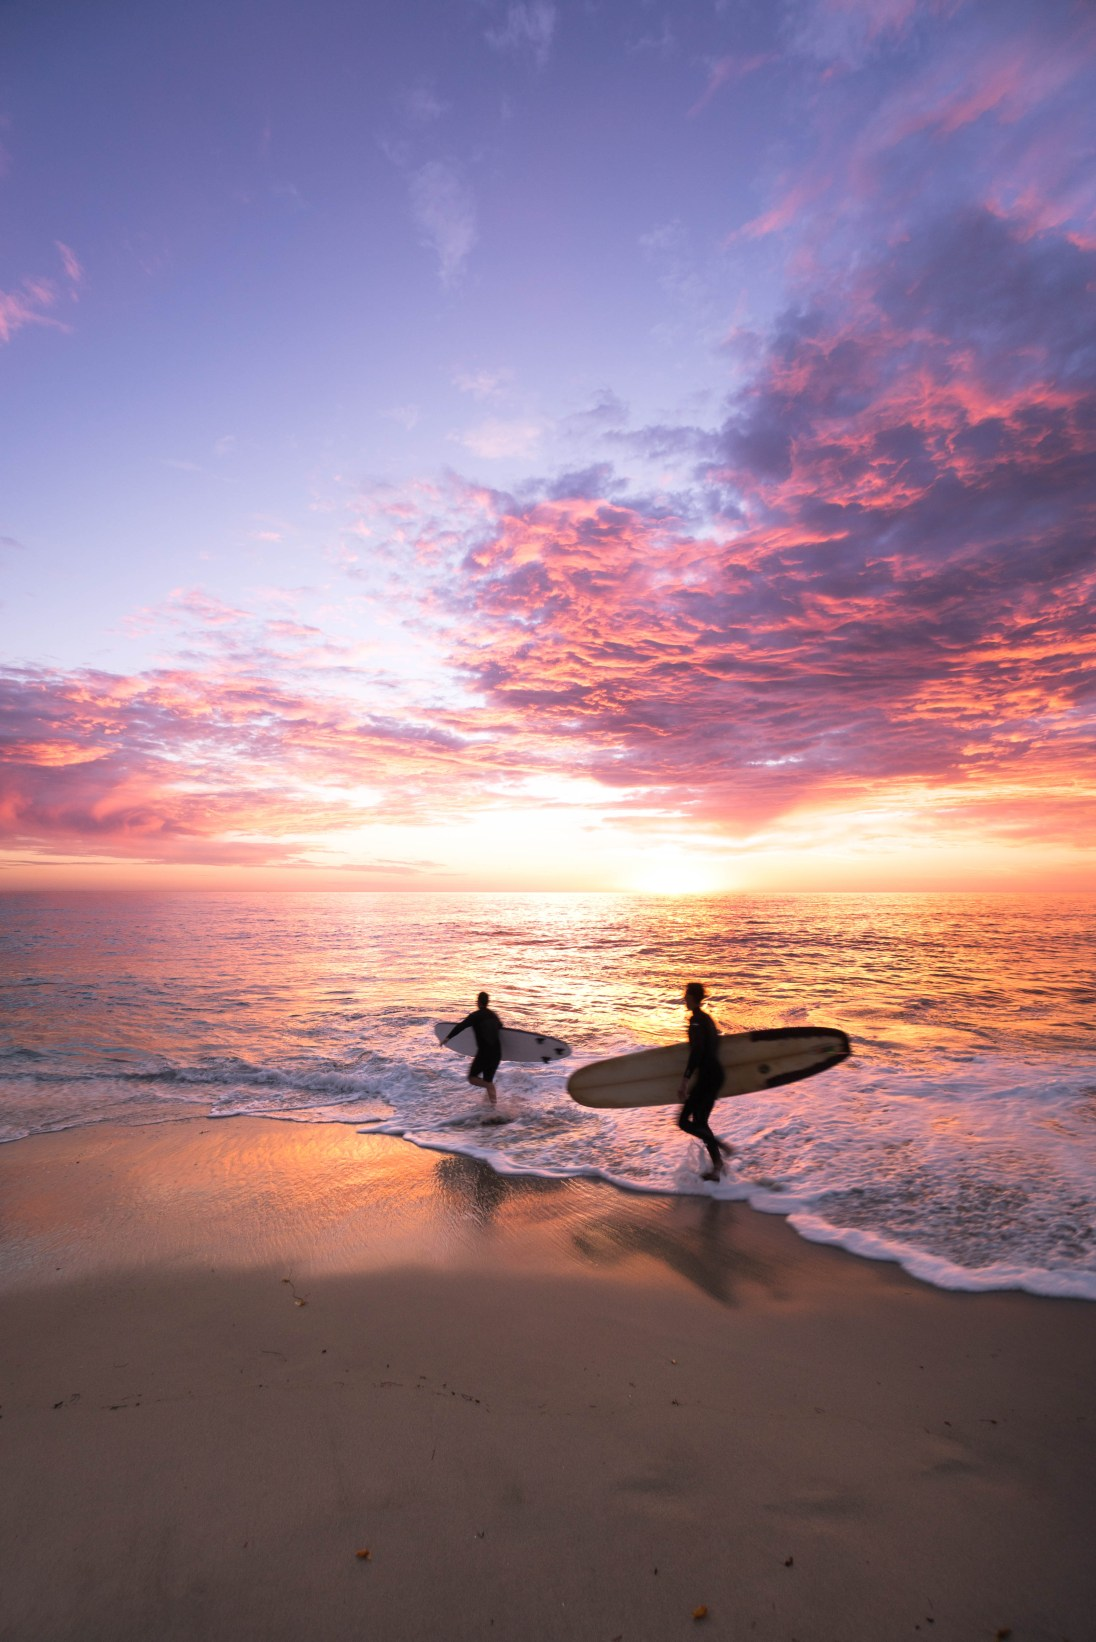 Stalking Surfers